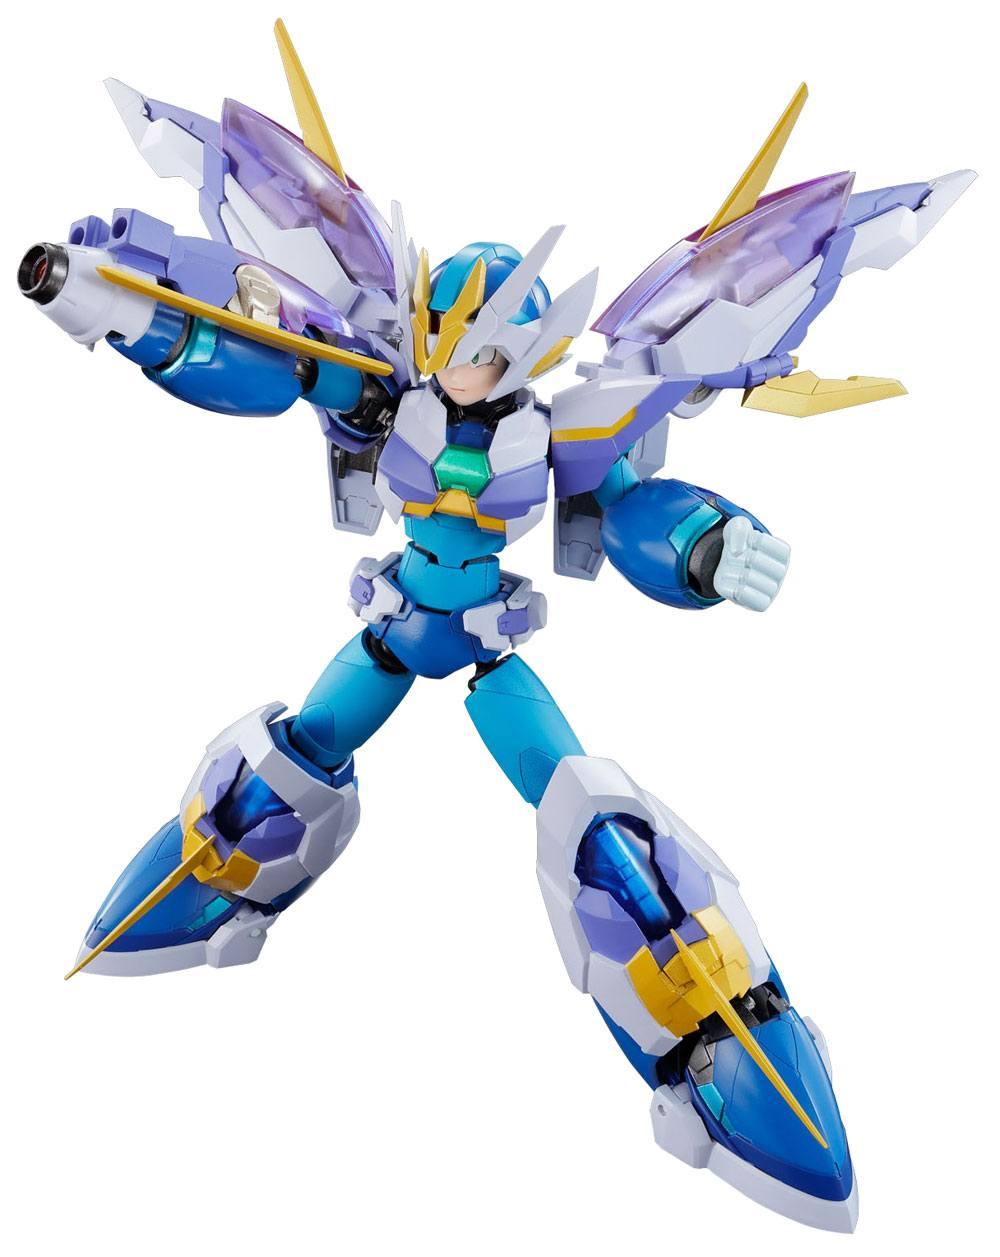 Megaman X Chogokin Diecast Action Figure Megaman X Giga Armor X Ver. 14 cm